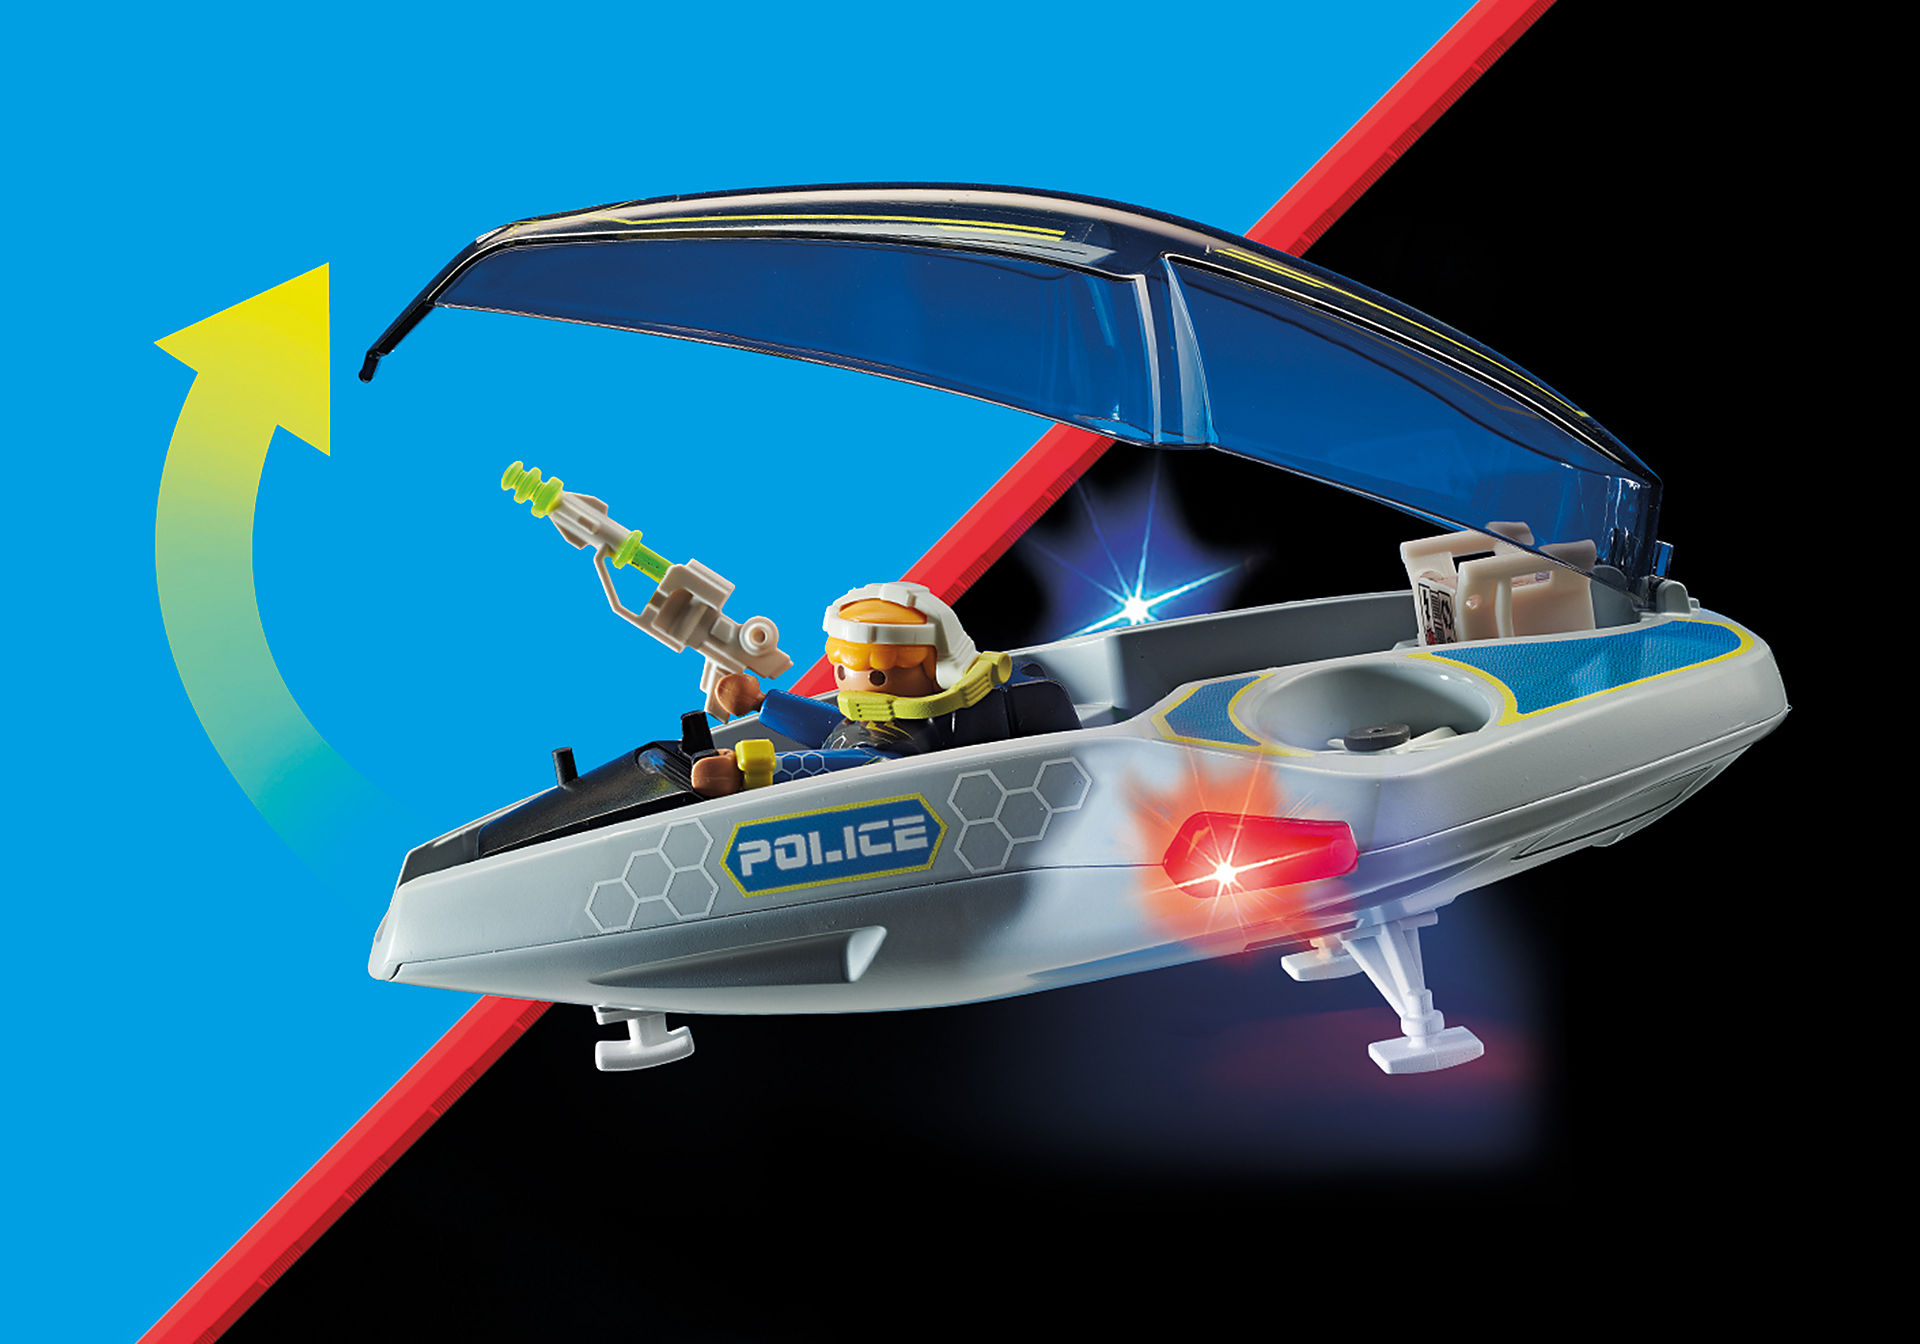 70019 Véhicule volant des policiers de l'espace  zoom image5